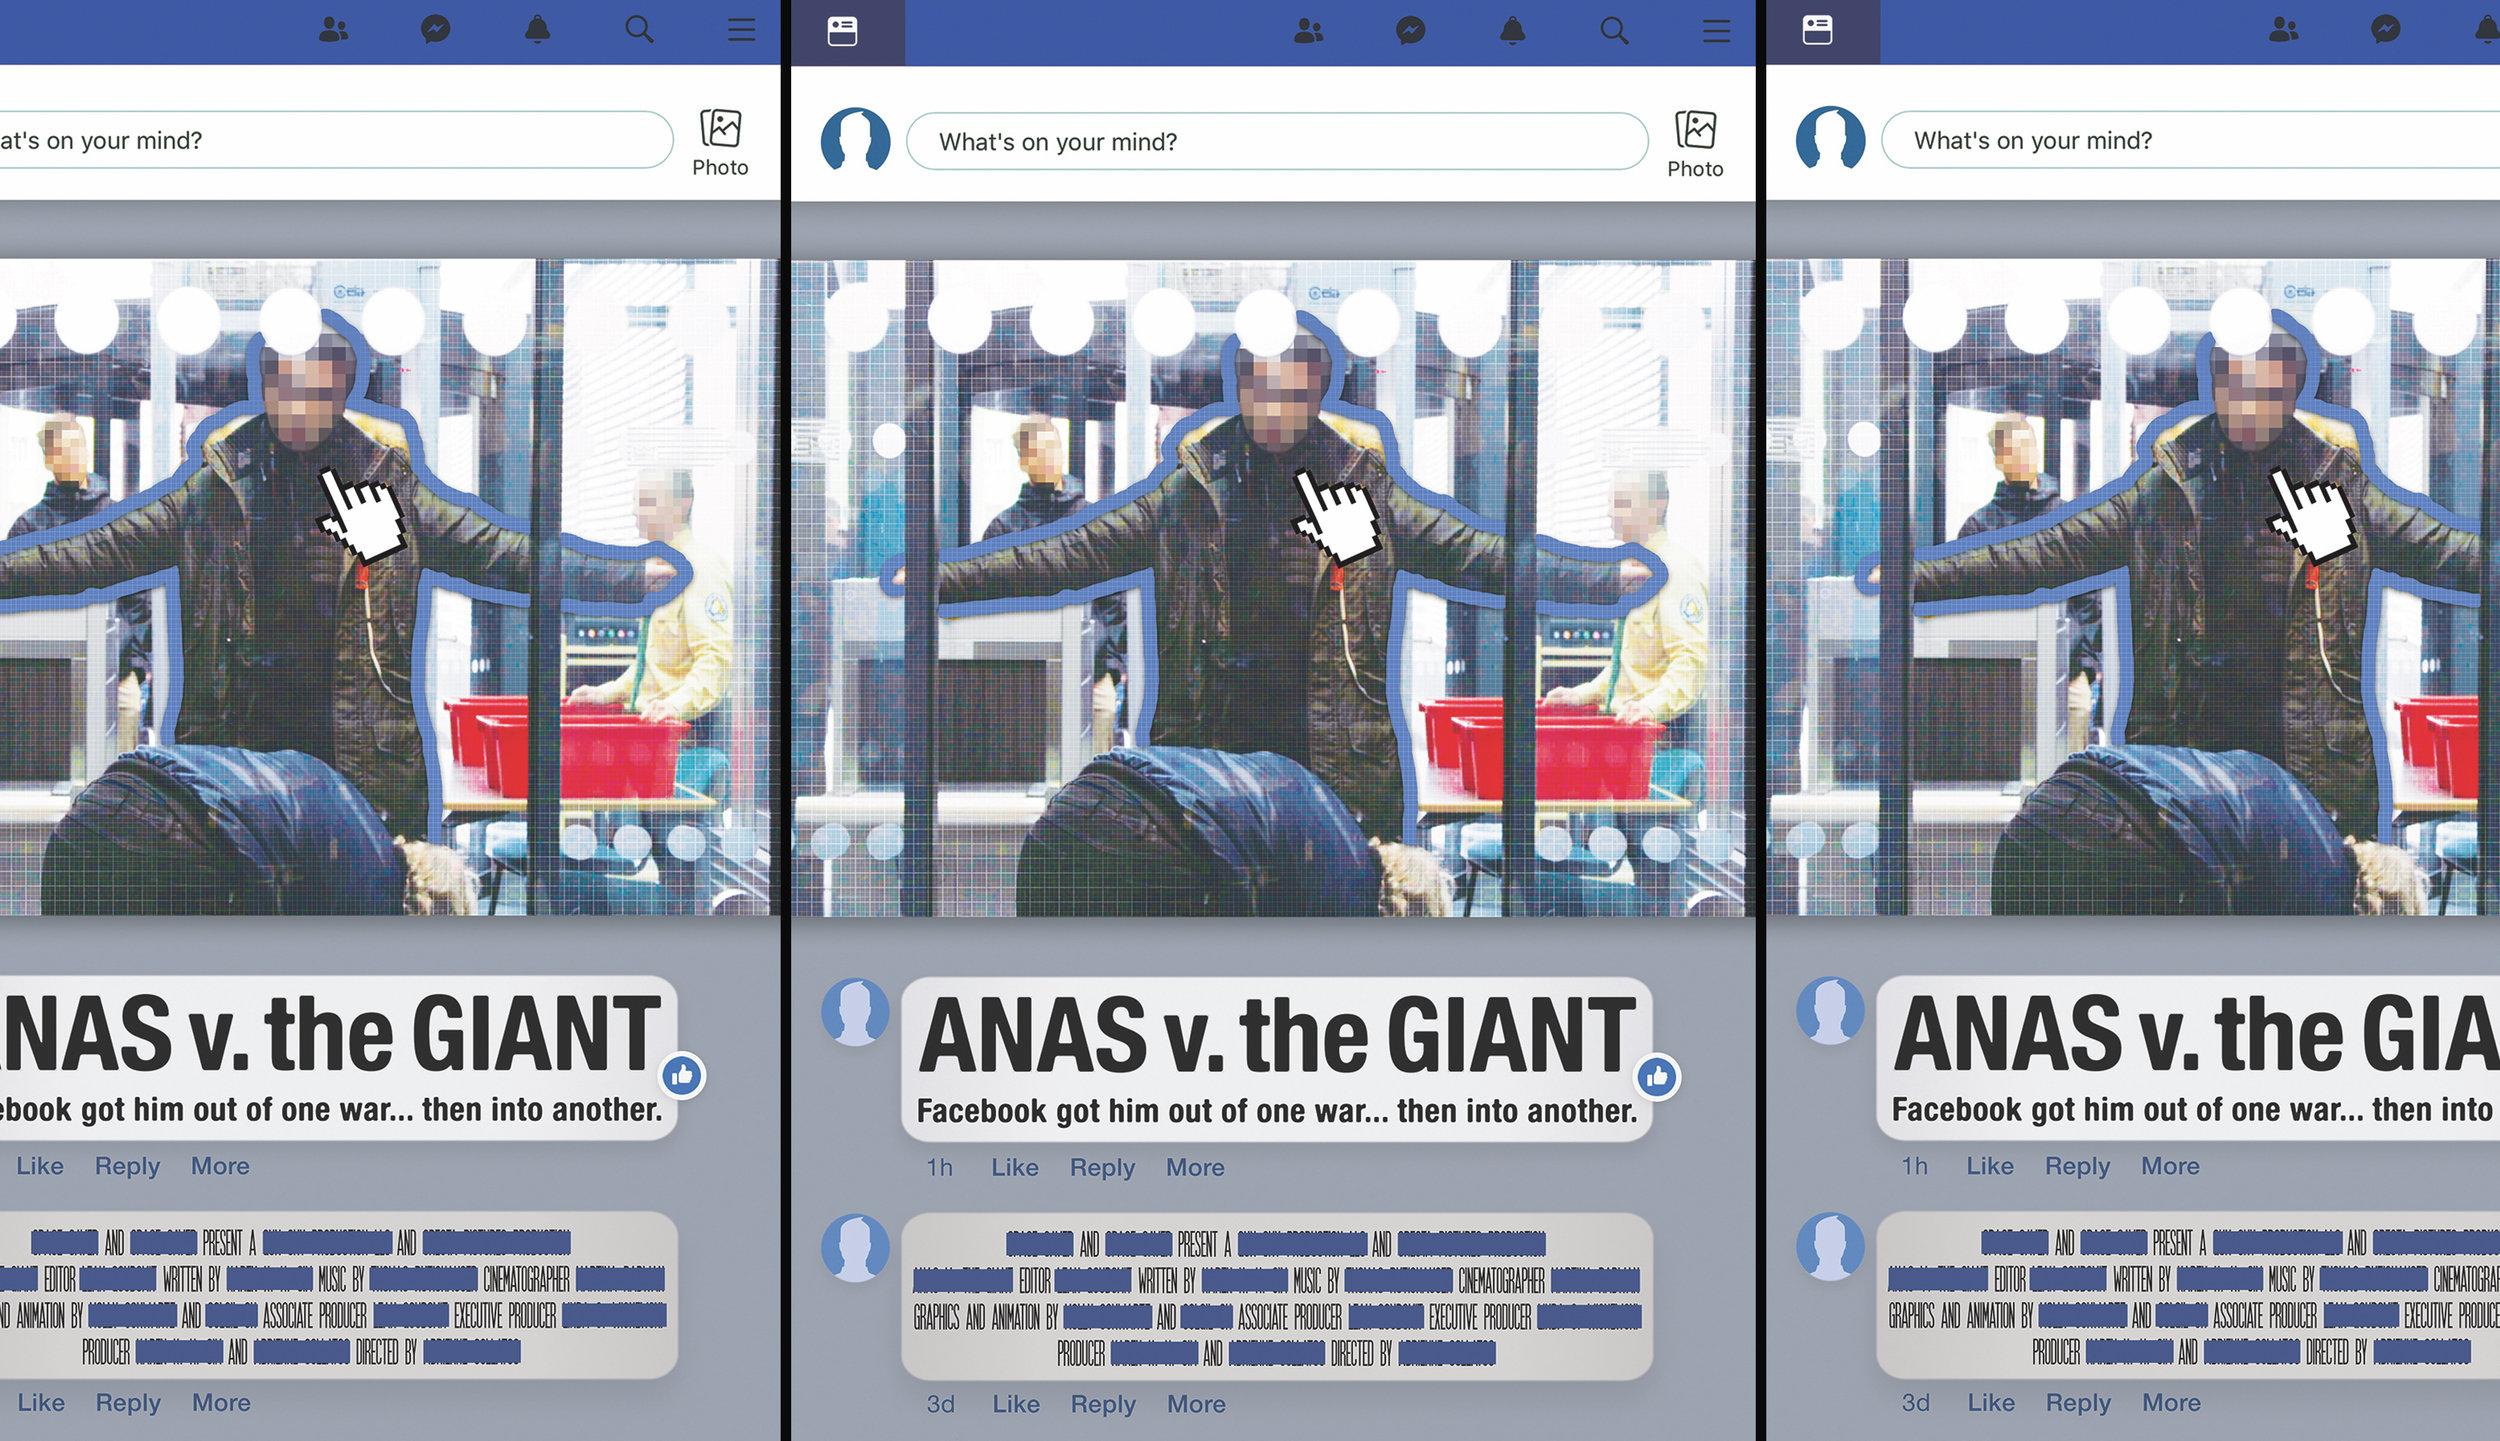 Anas v the Giant_03.jpg